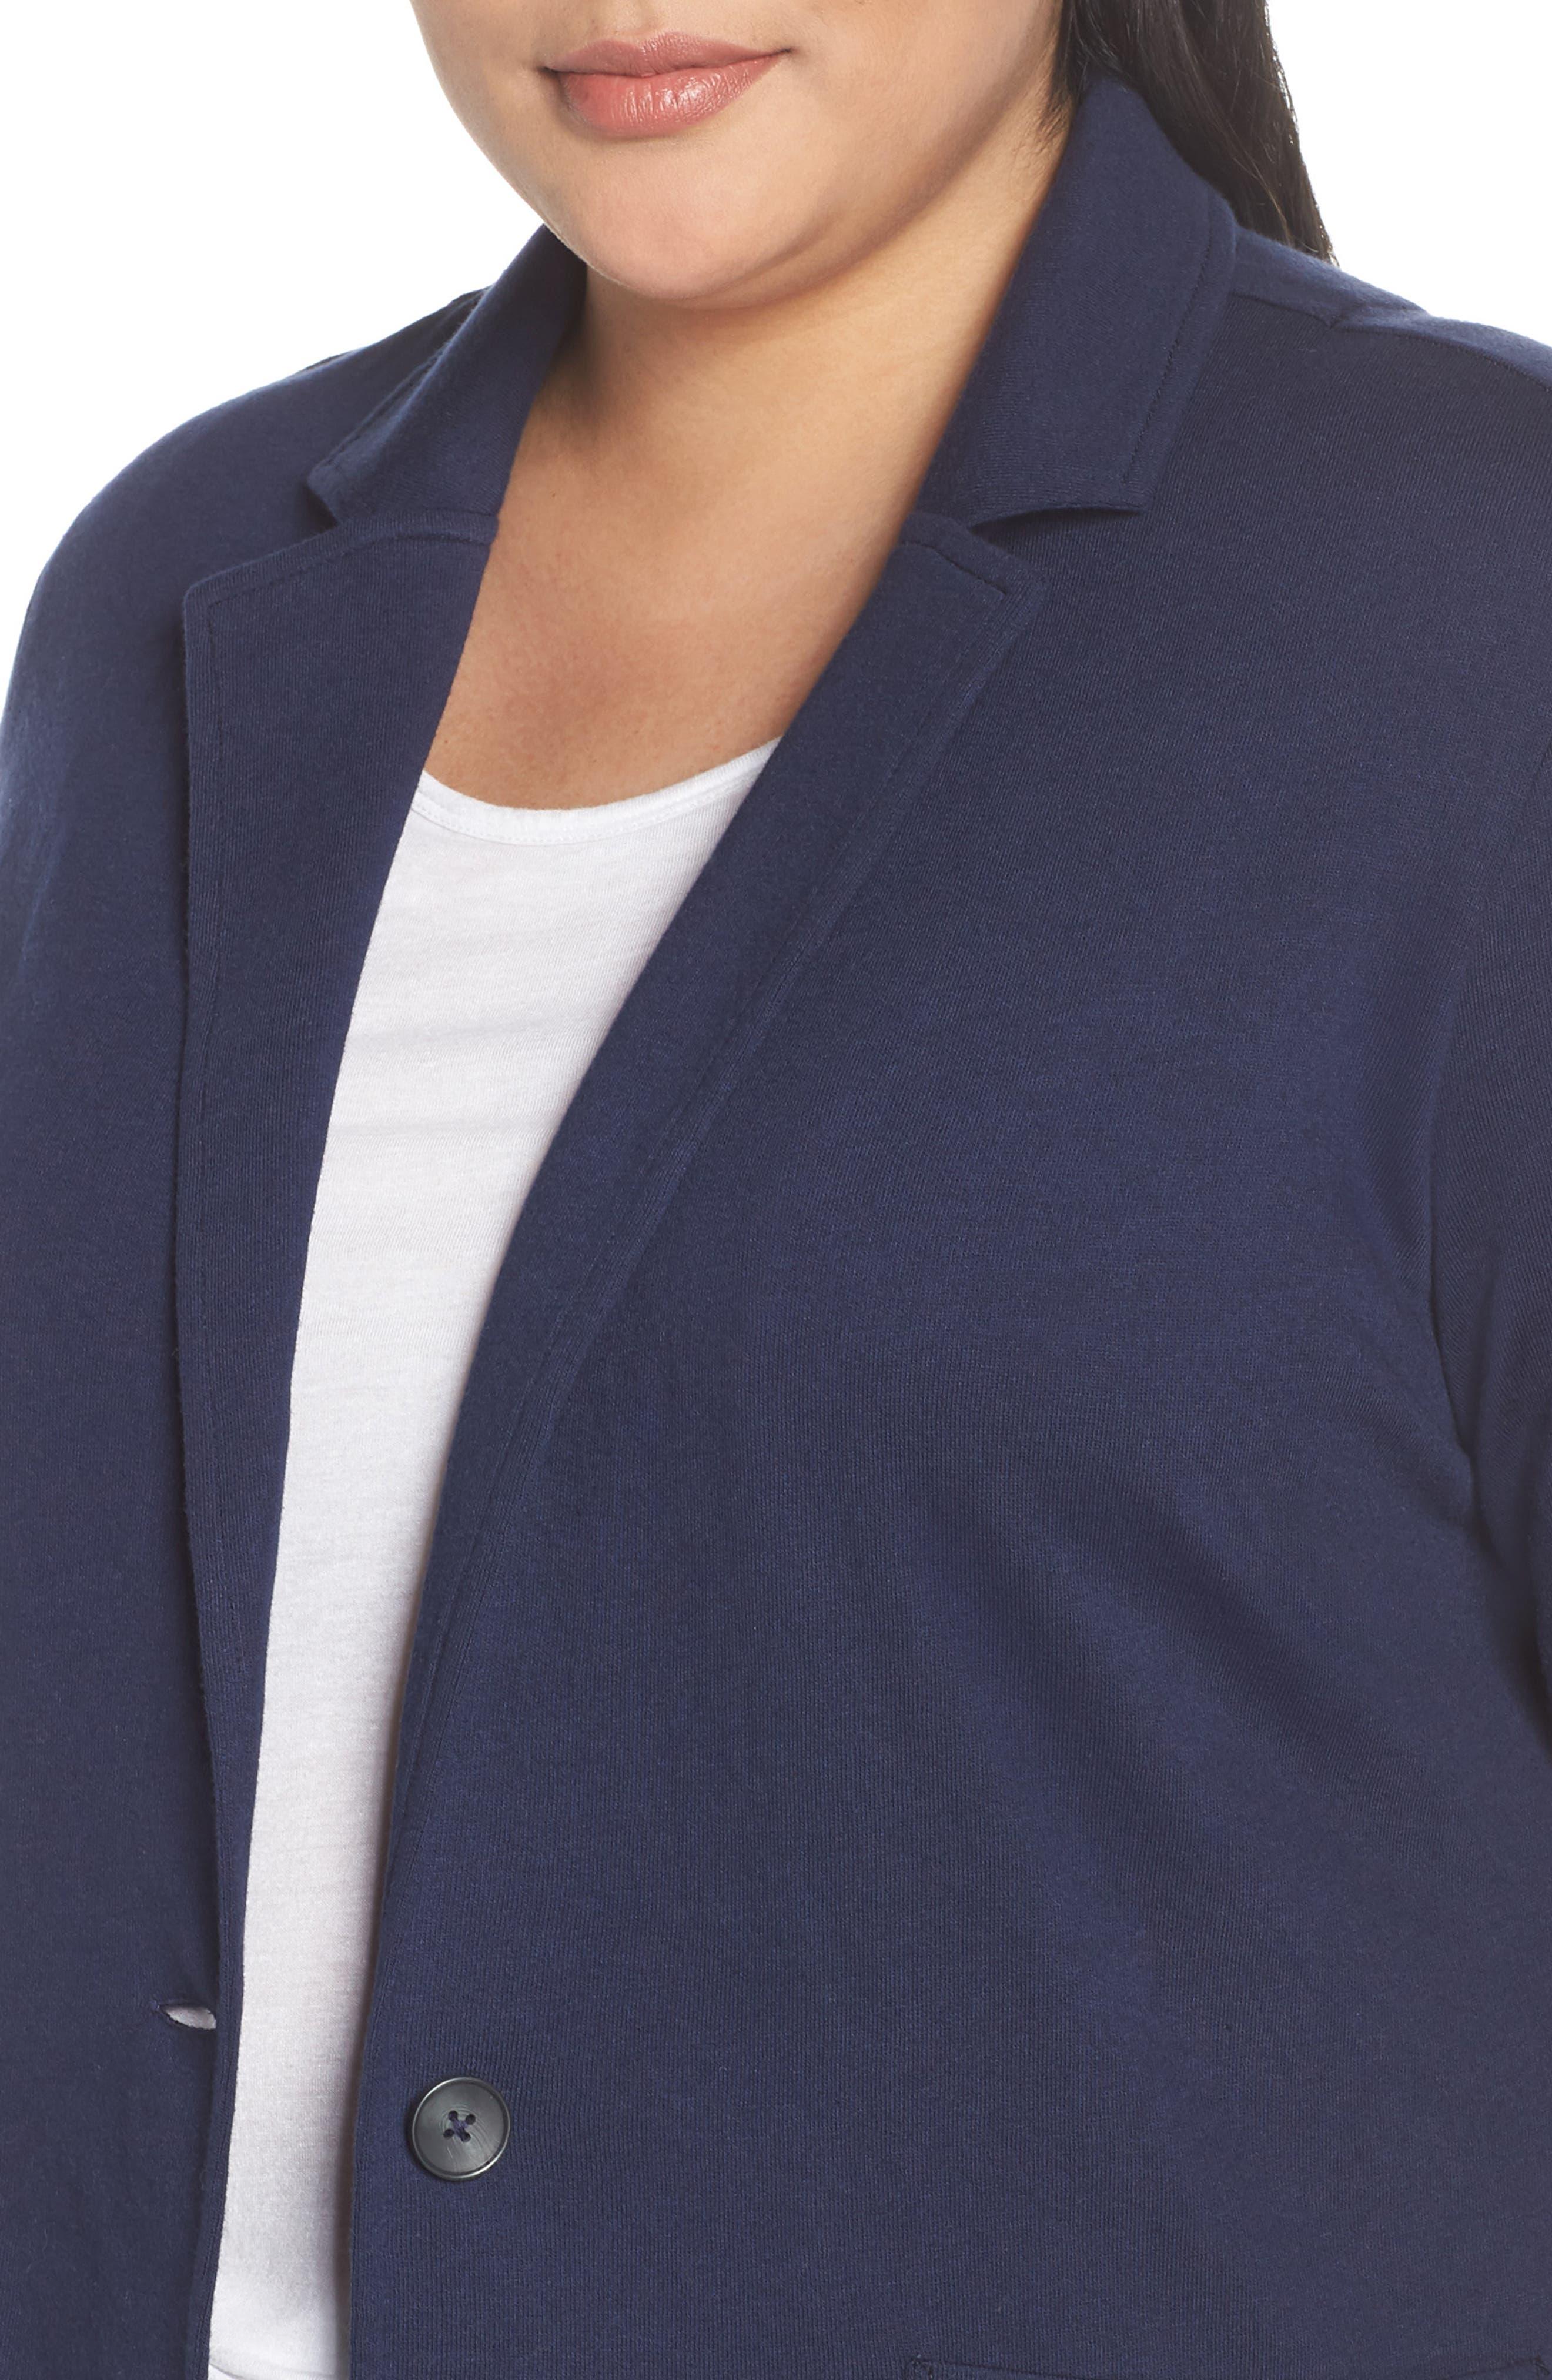 CASLON<SUP>®</SUP>, Double Pocket Knit Blazer, Alternate thumbnail 5, color, NAVY PEACOAT